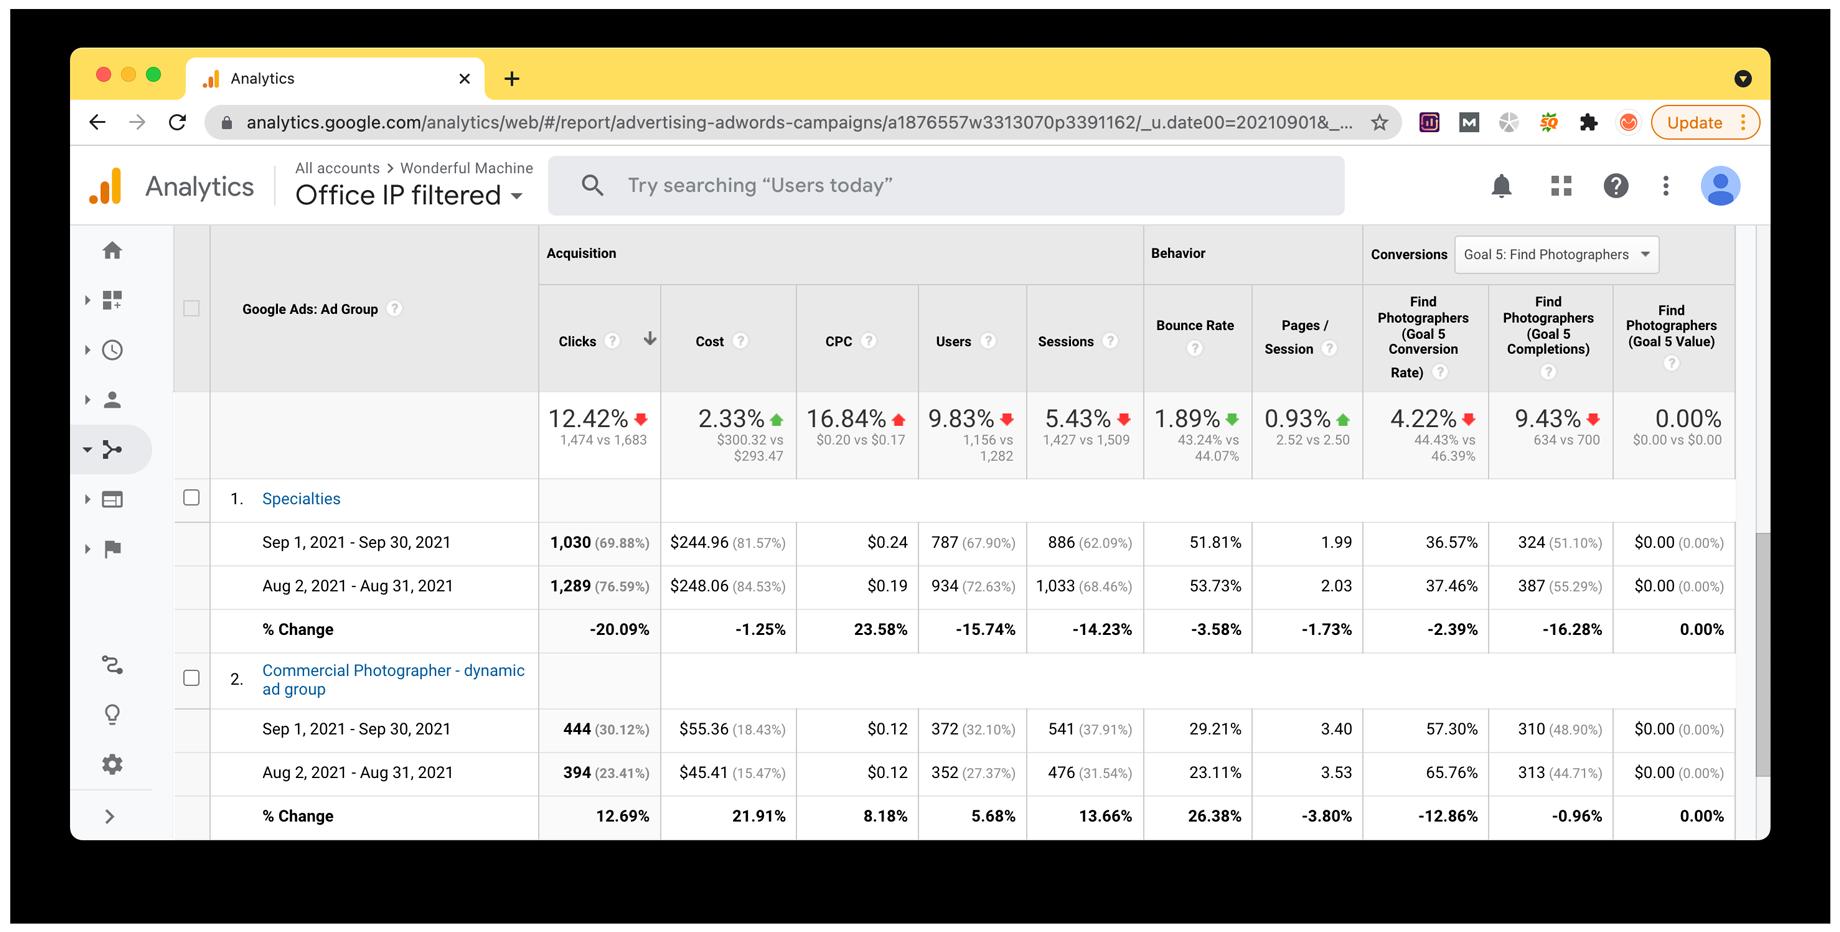 Screenshot of Google Analytics' data on Wonderful Machine's ad groups during September 2021